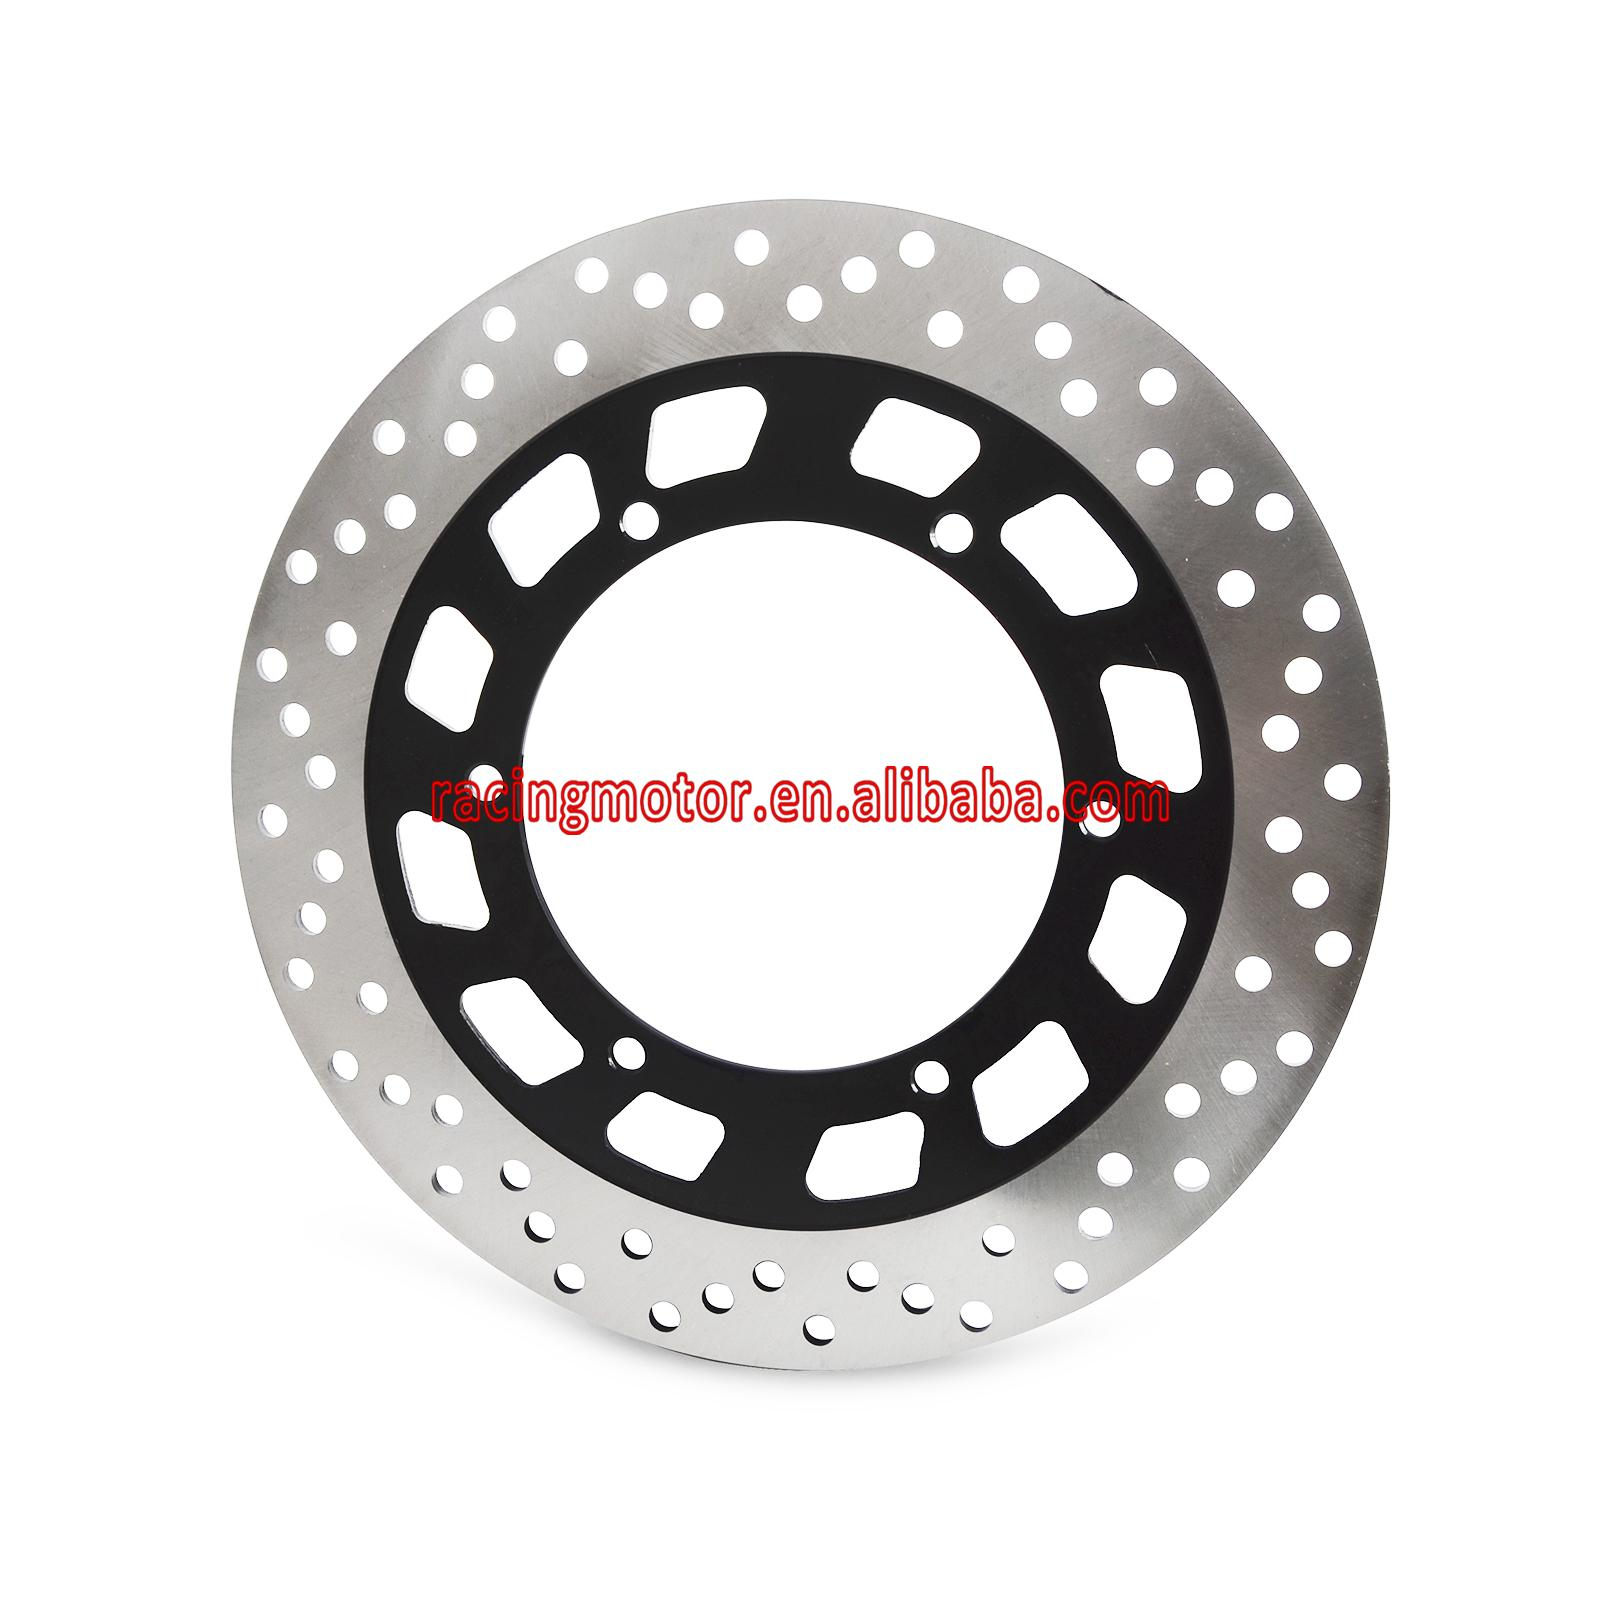 Rear Brake Disc Rotor For Yamaha XVS1100 Drag Star 1100 1999 2006 FJR1300 2003 2017 FJR